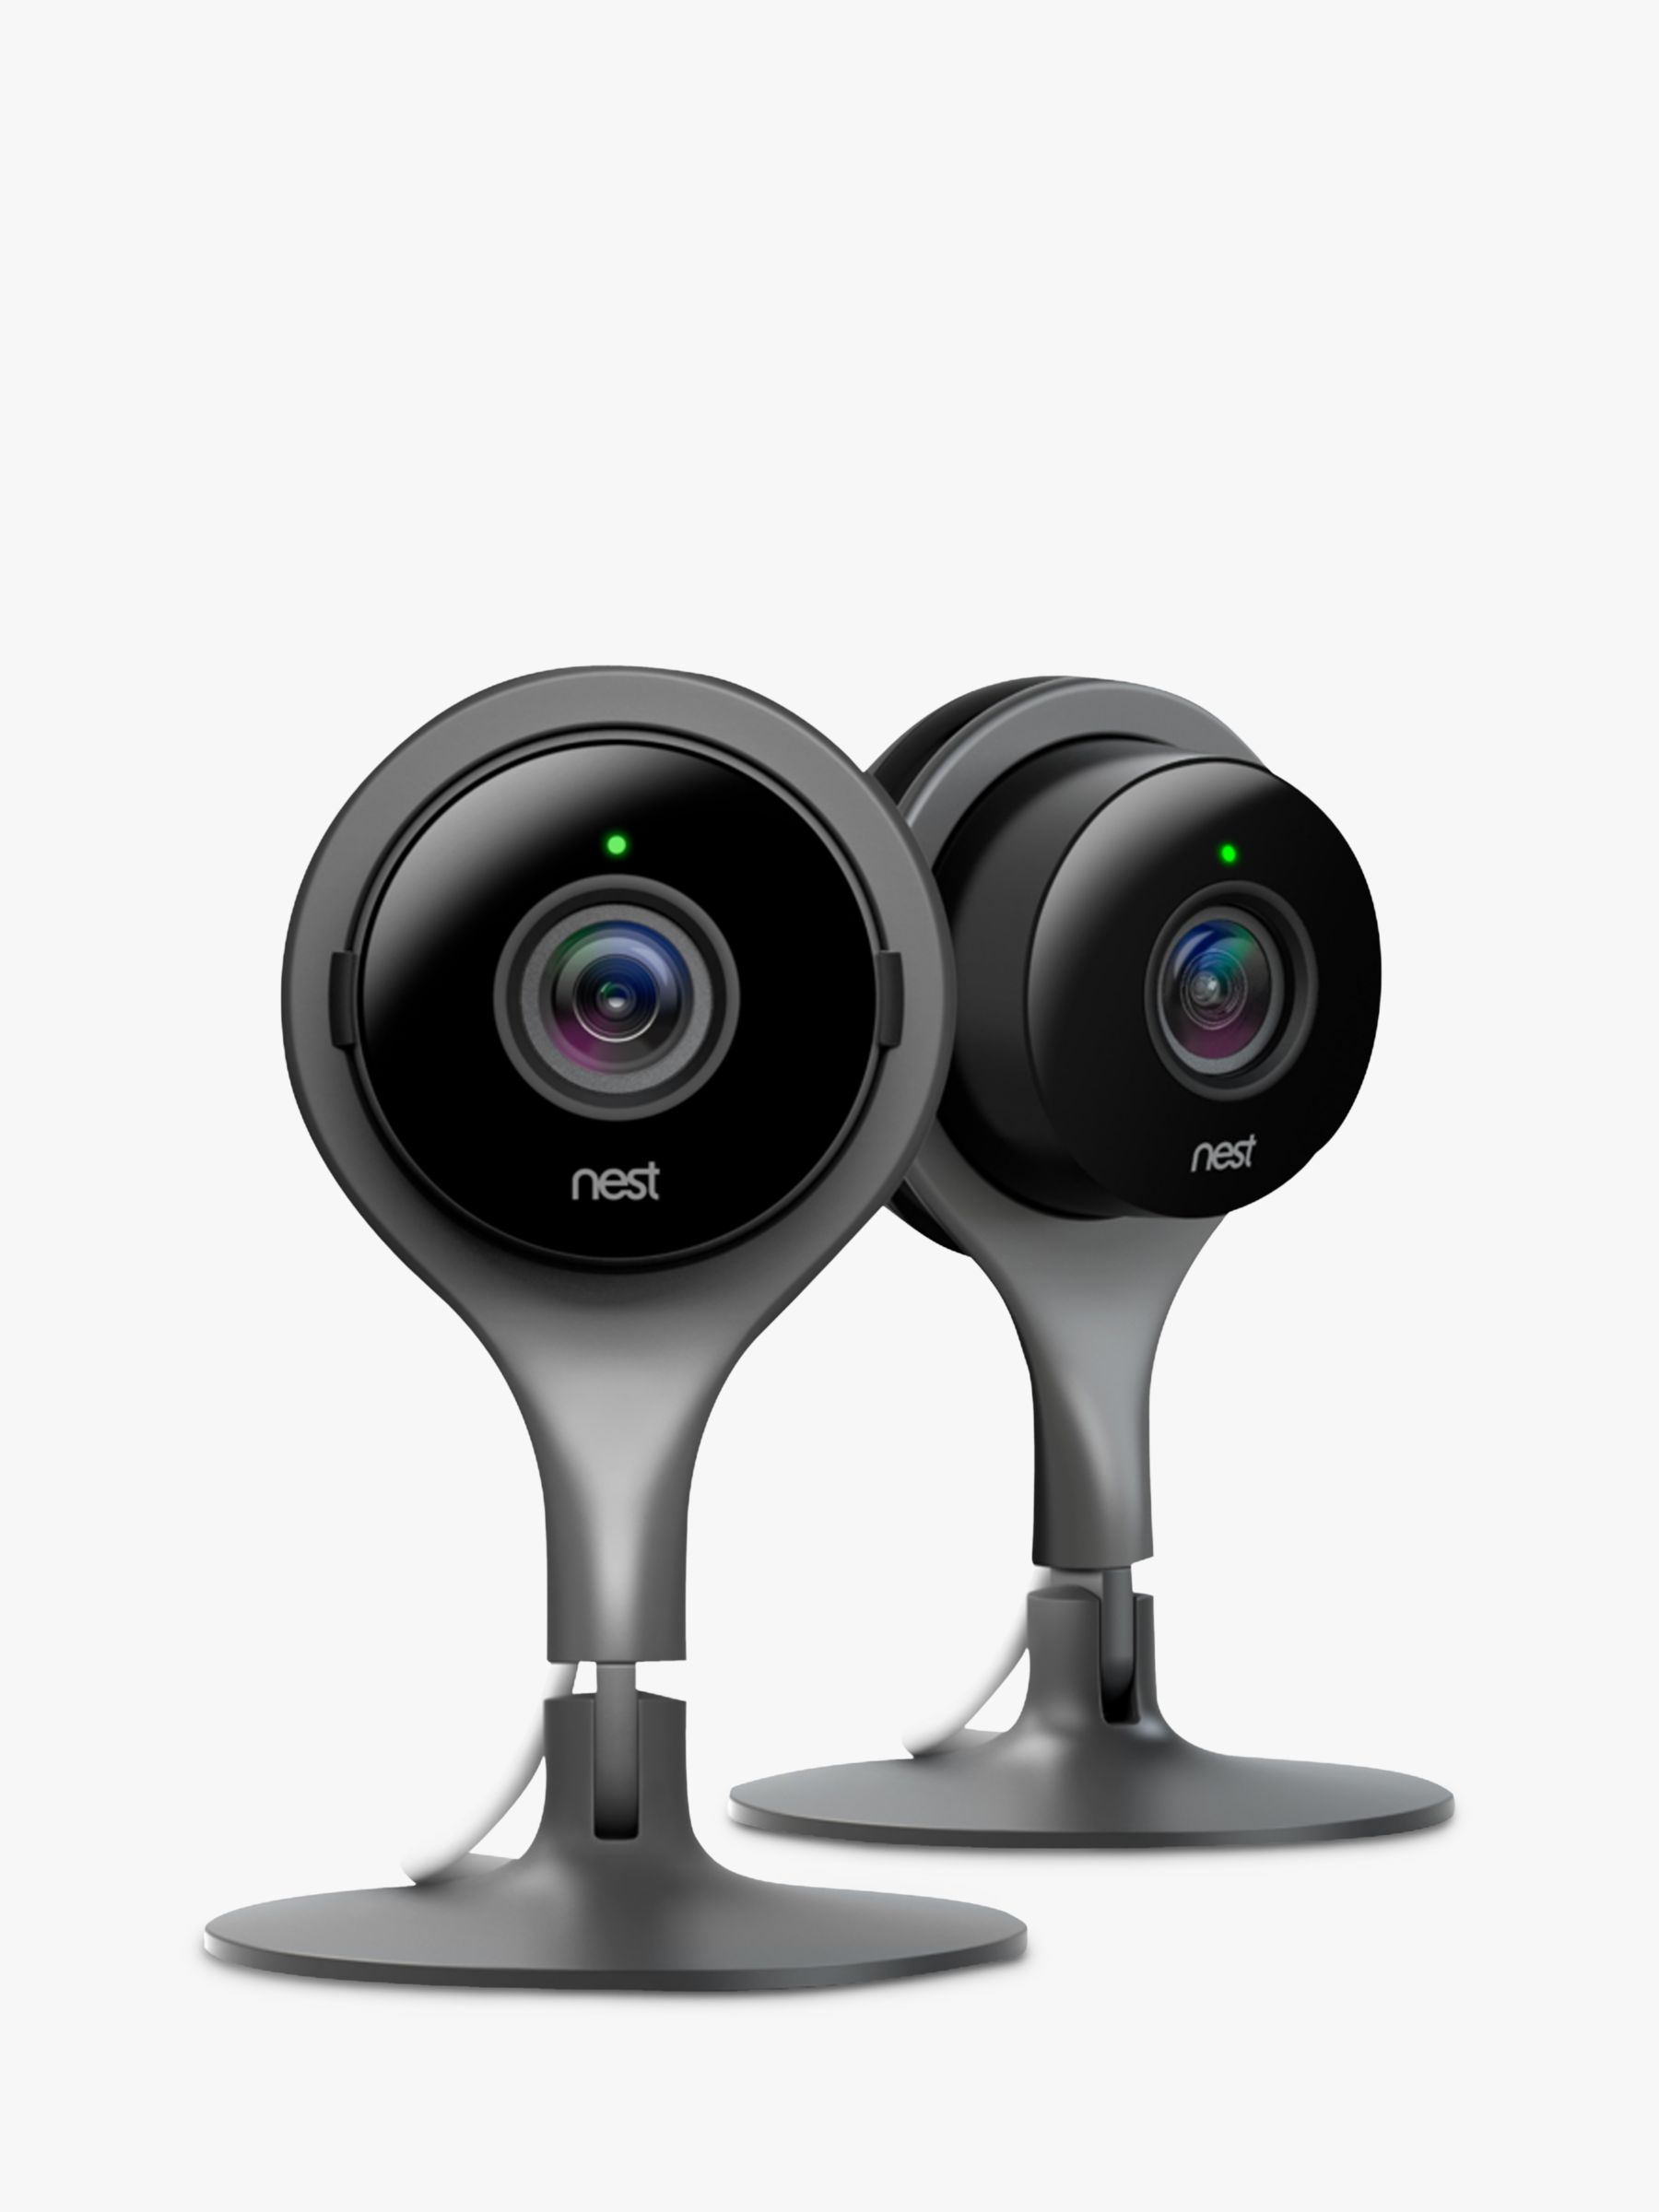 Nest Nest Cam Indoor Security Camera, Pack of 2